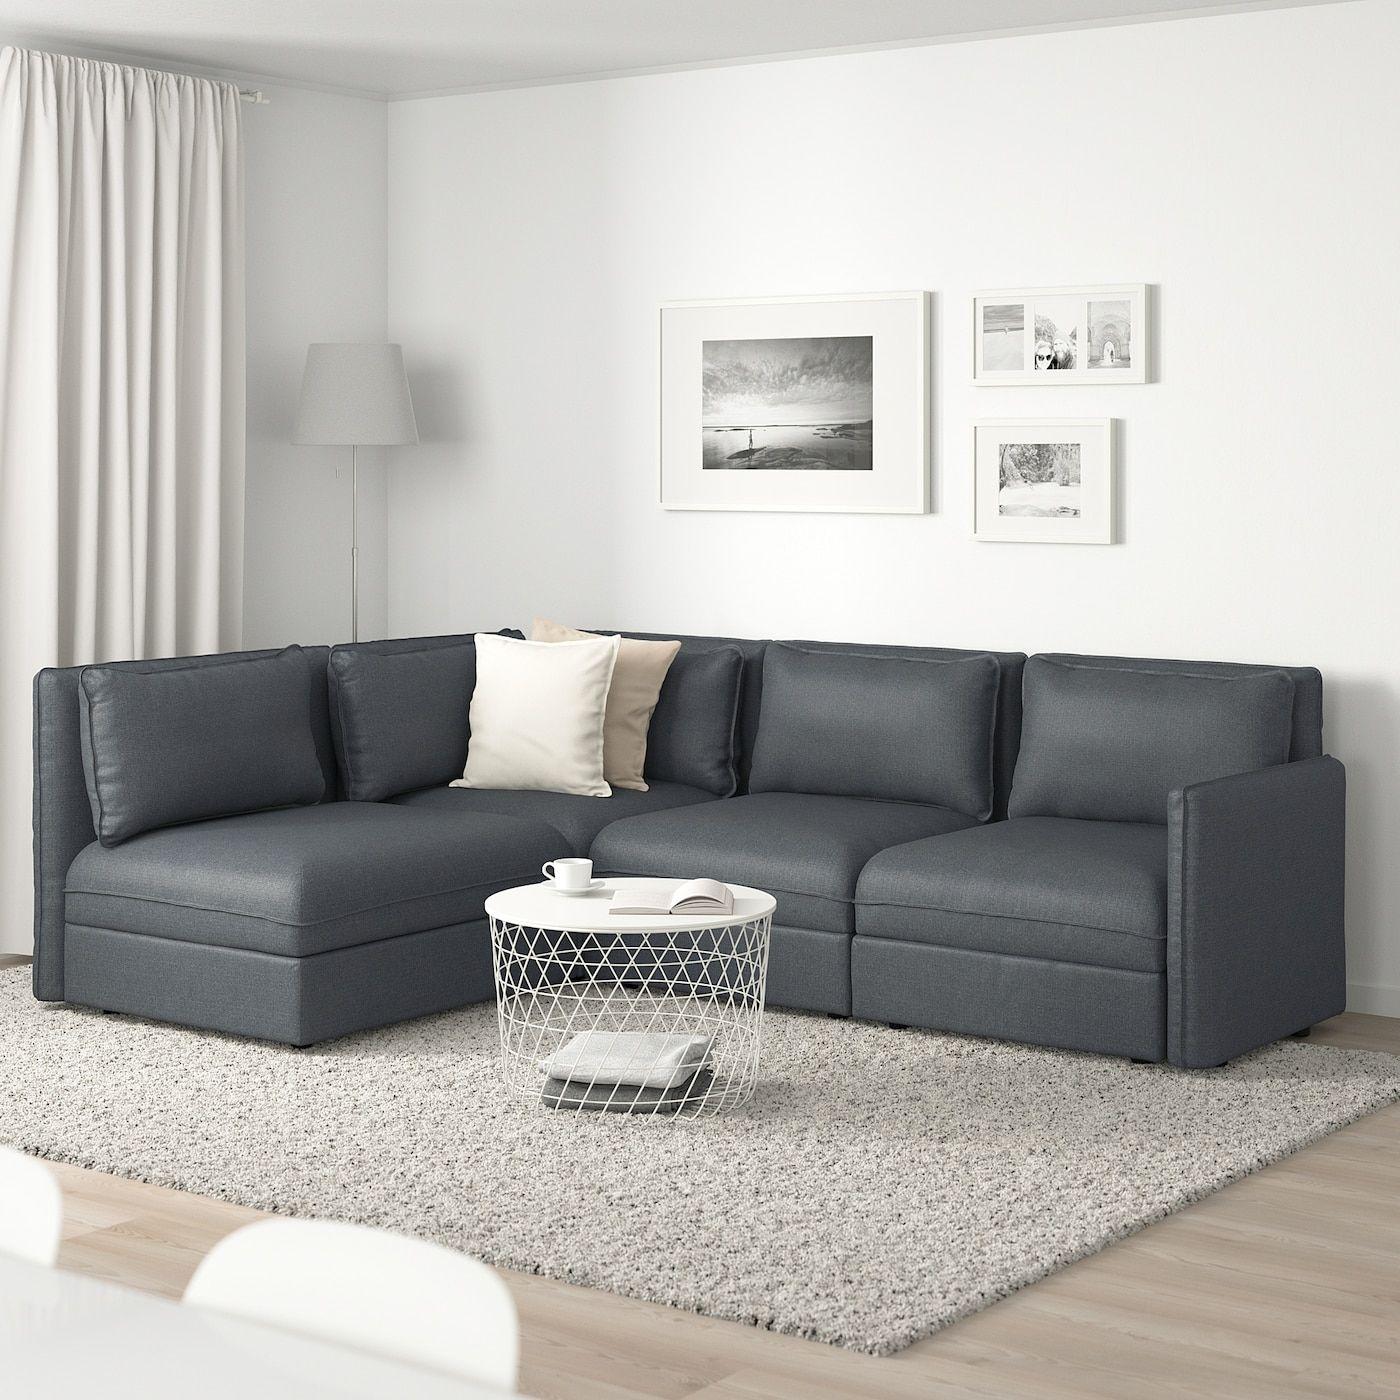 Vallentuna Modular Corner Sofa 3 Seat With Storage Hillared